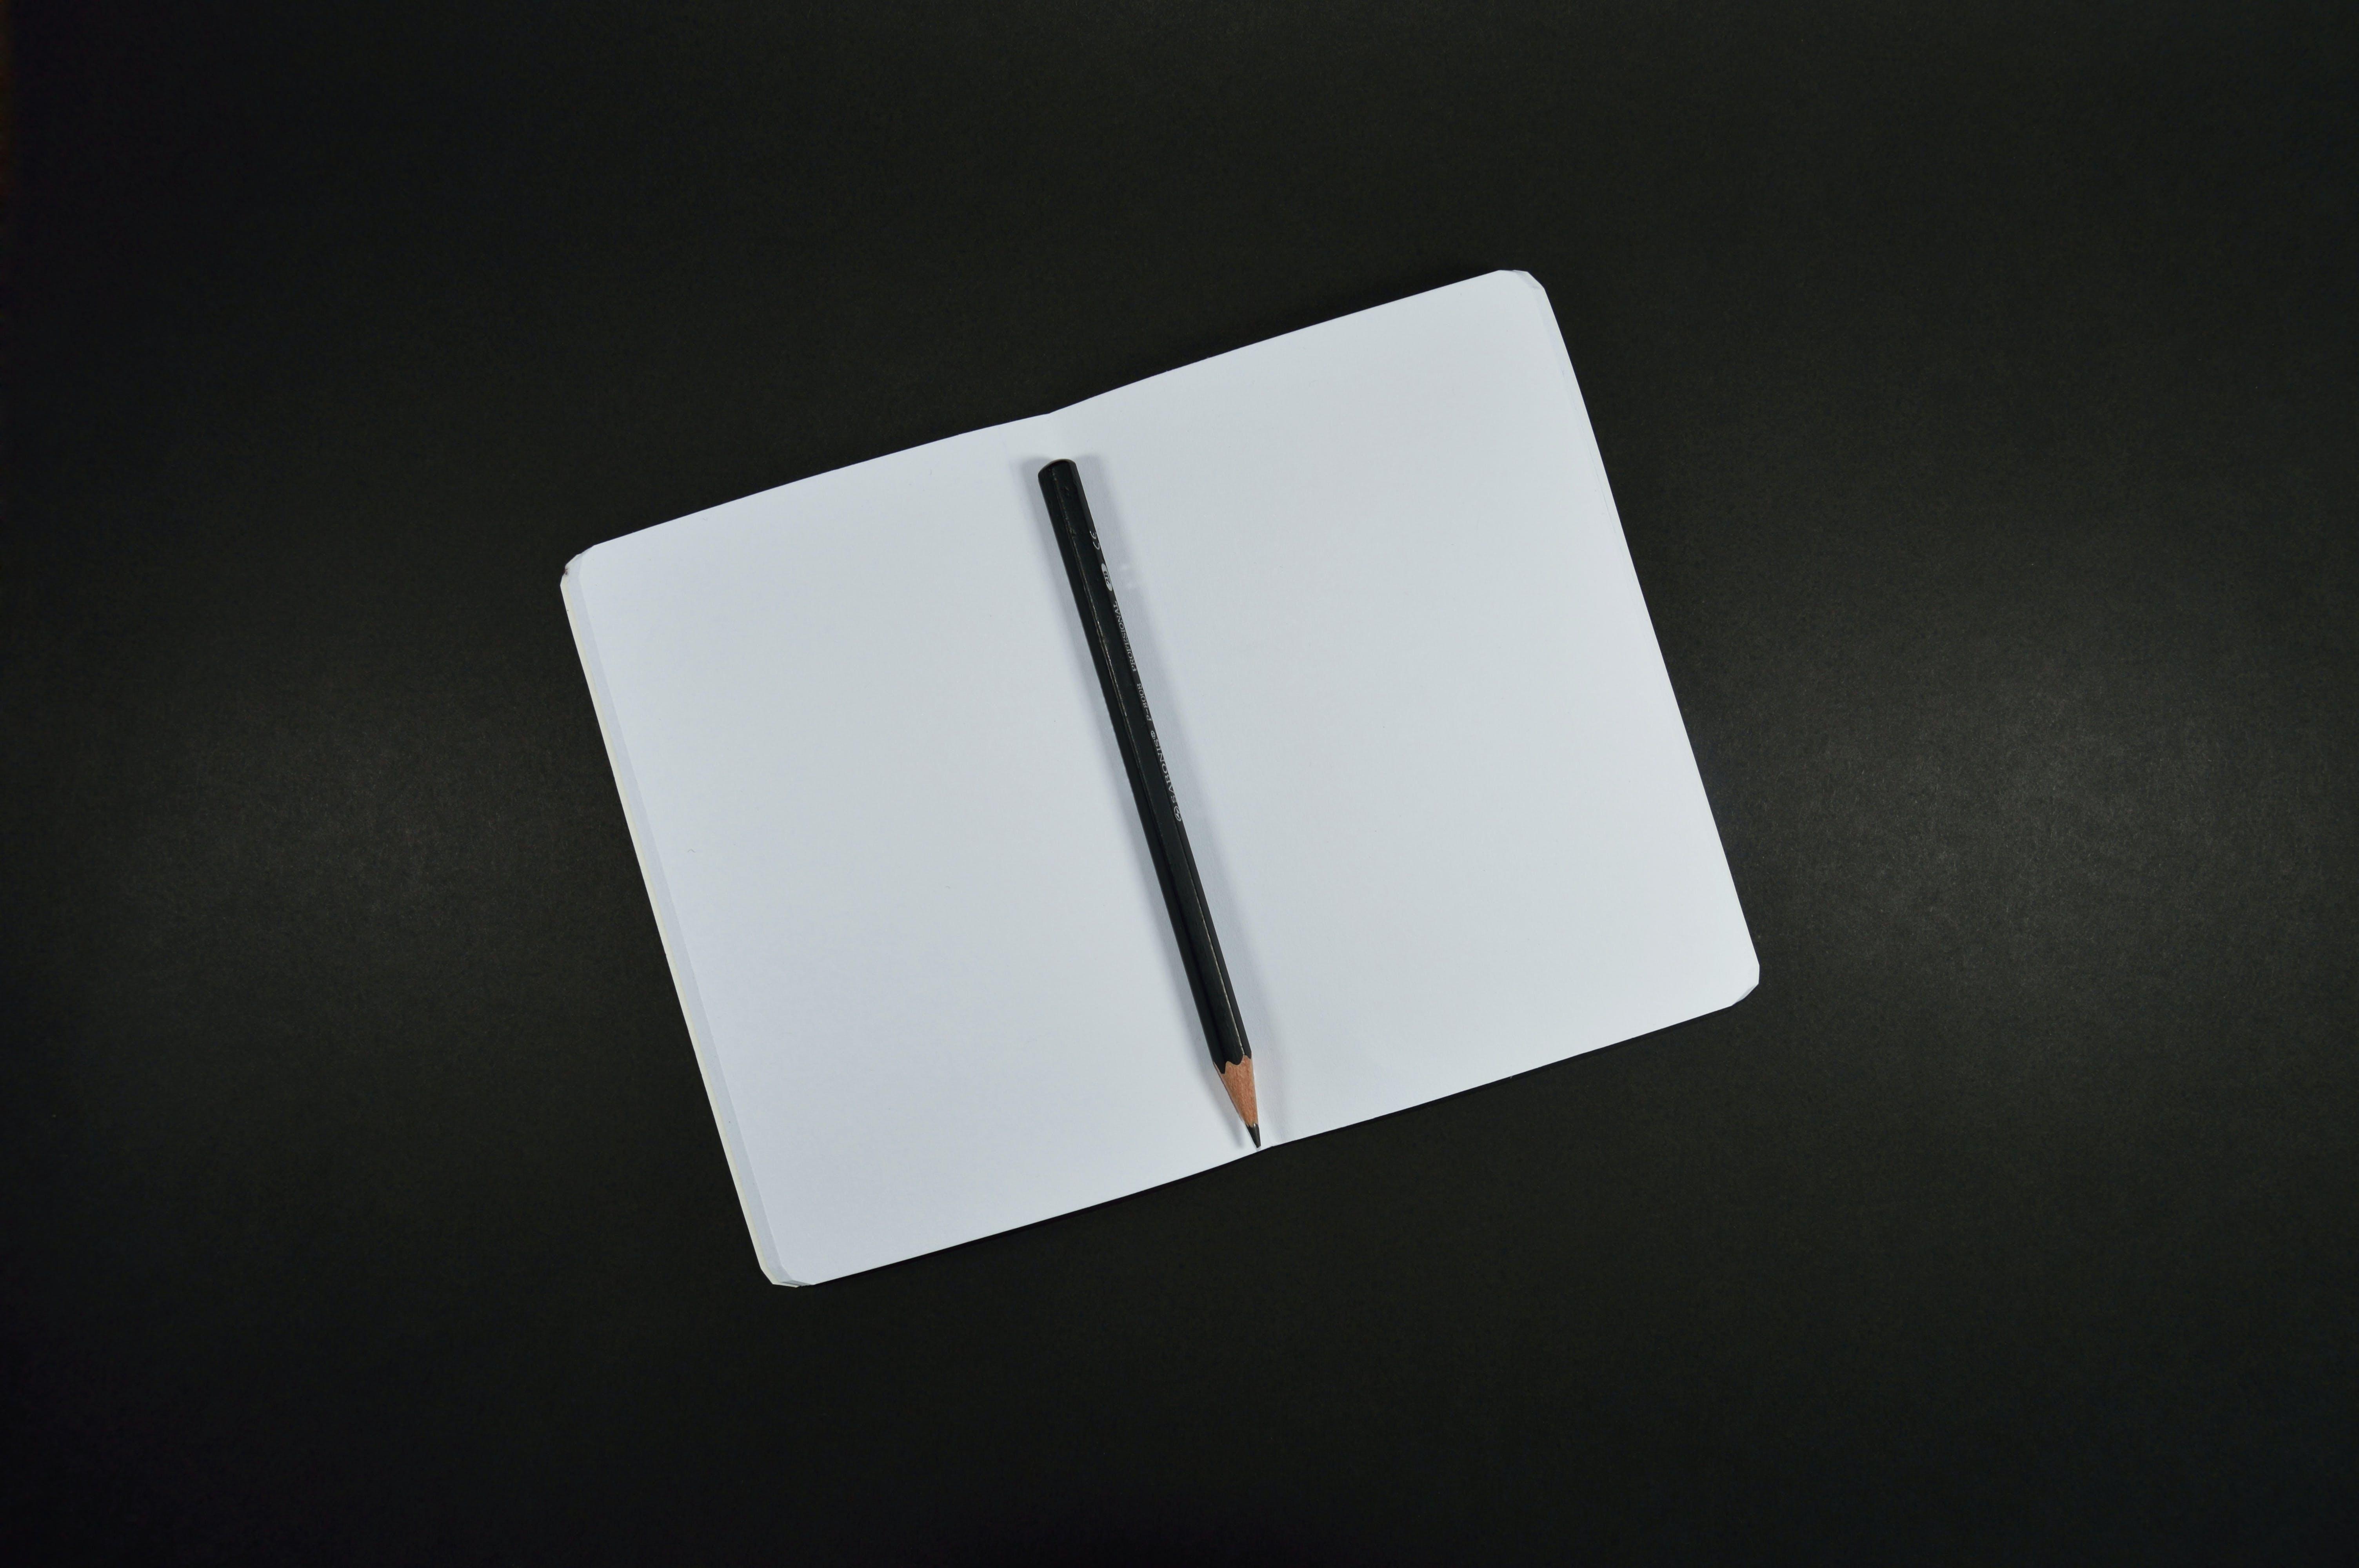 agenda, bloc, bloc de notes